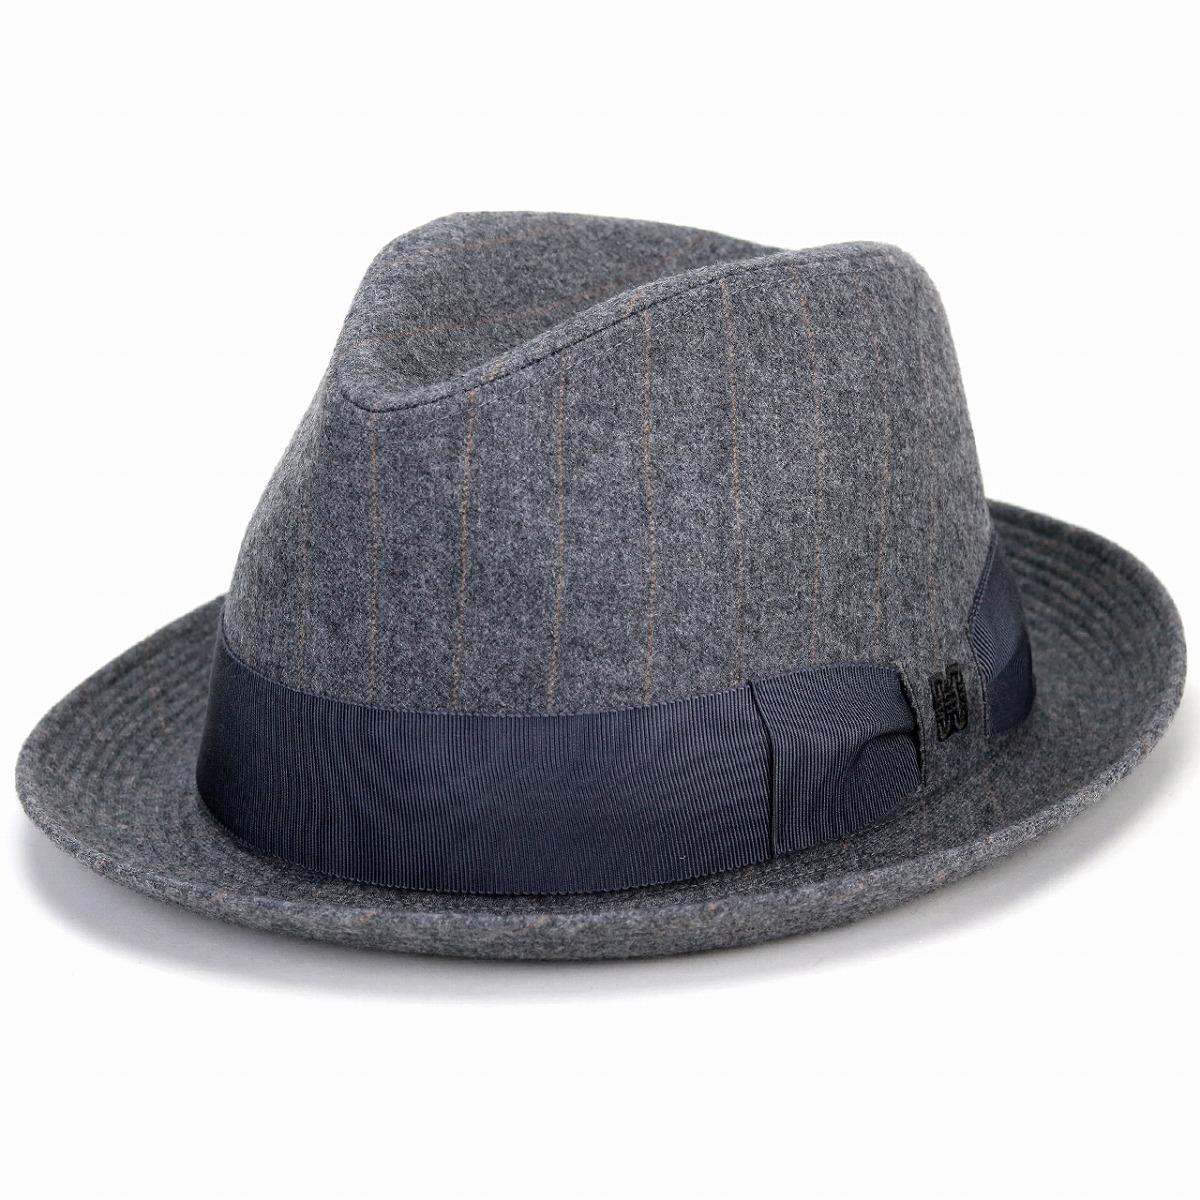 28e0576603065 ELEHELM HAT STORE    gray  fedora  man Christmas present hat made in 100%  of DAKS hat felt hat stripe men daks soft felt hat Hattori Bonn Pineau type  wool ...